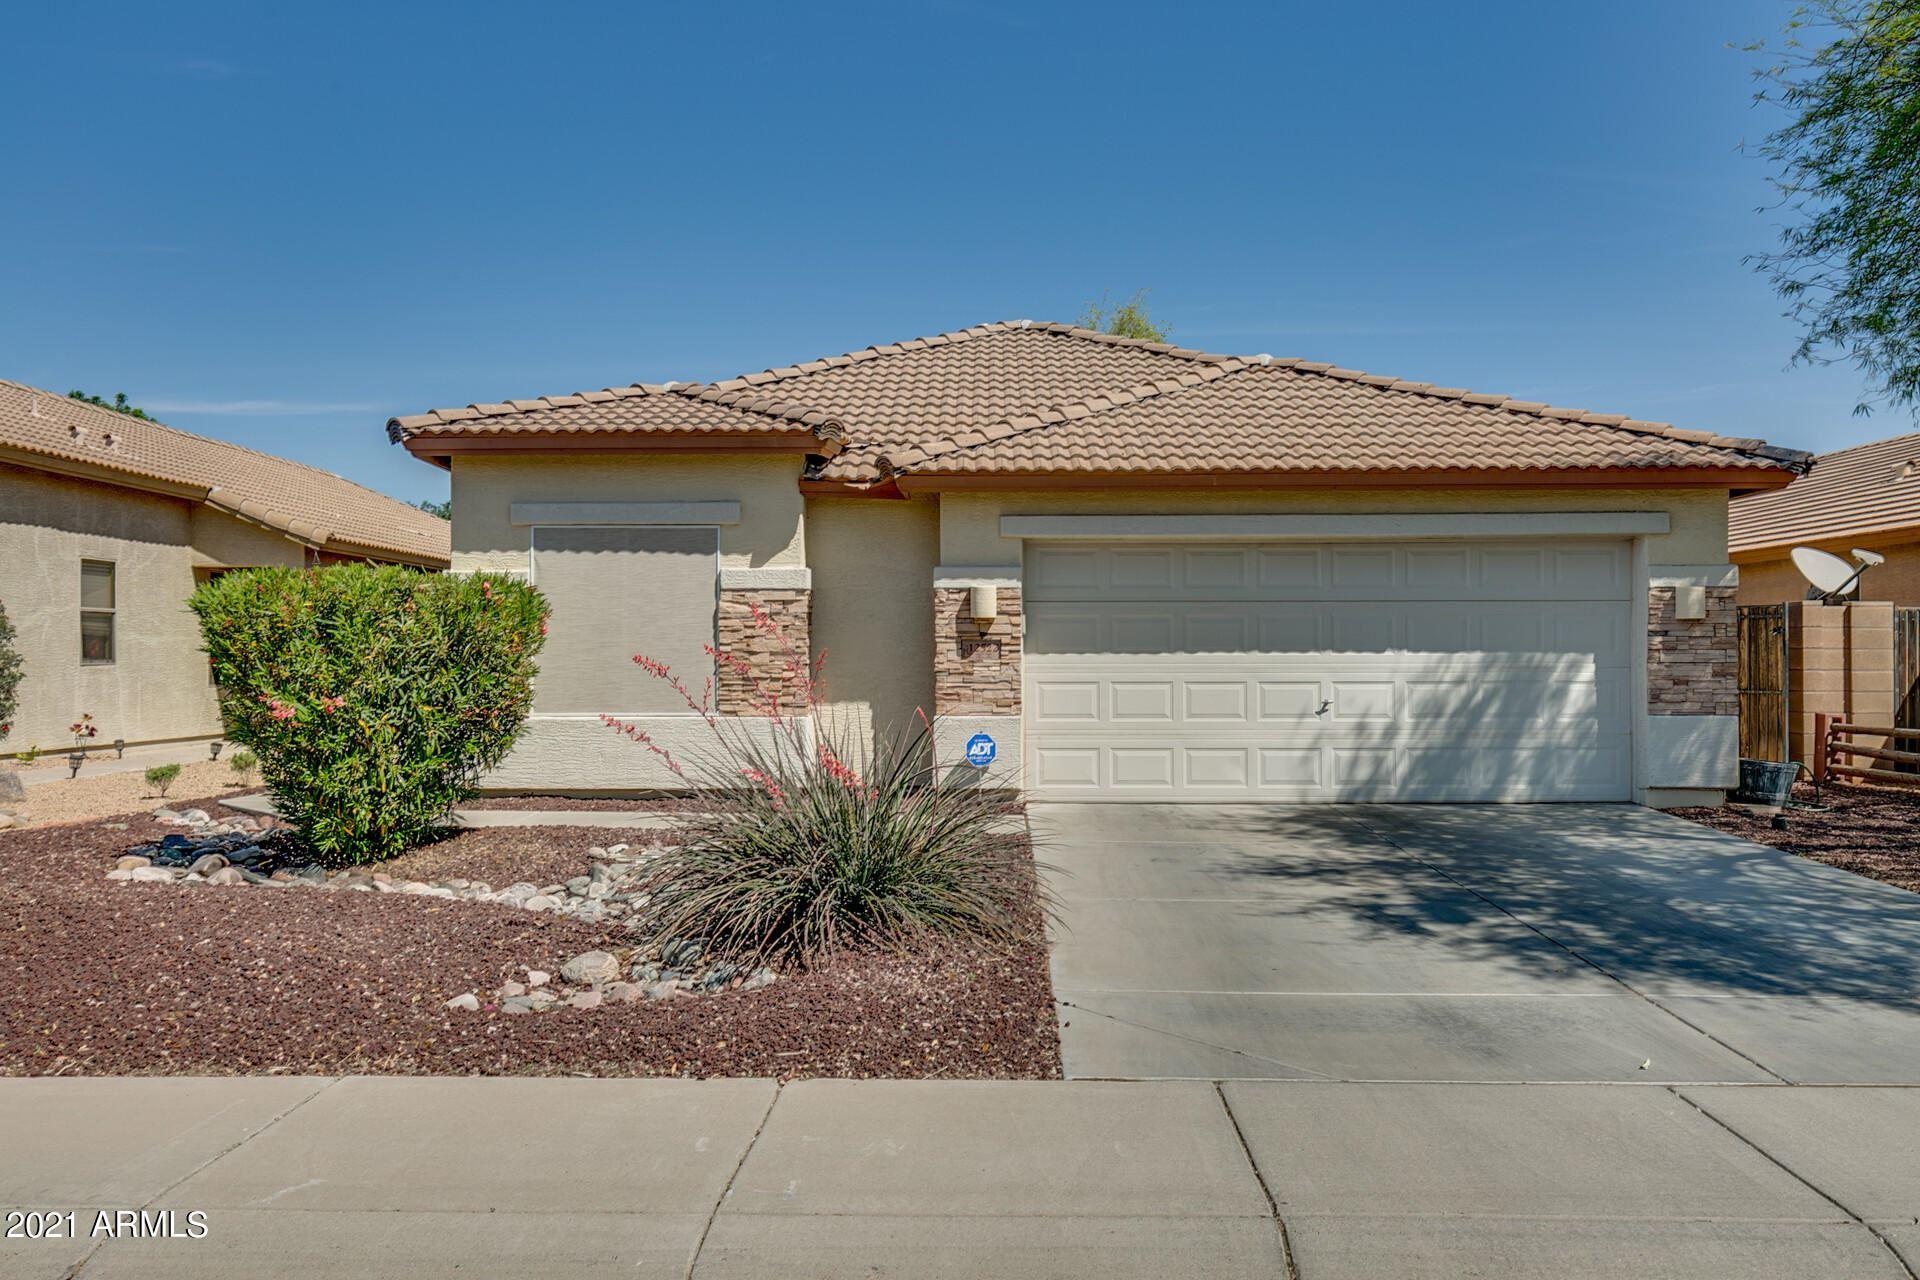 12522 W JACKSON Street, Avondale, AZ 85323 - MLS#: 6222704